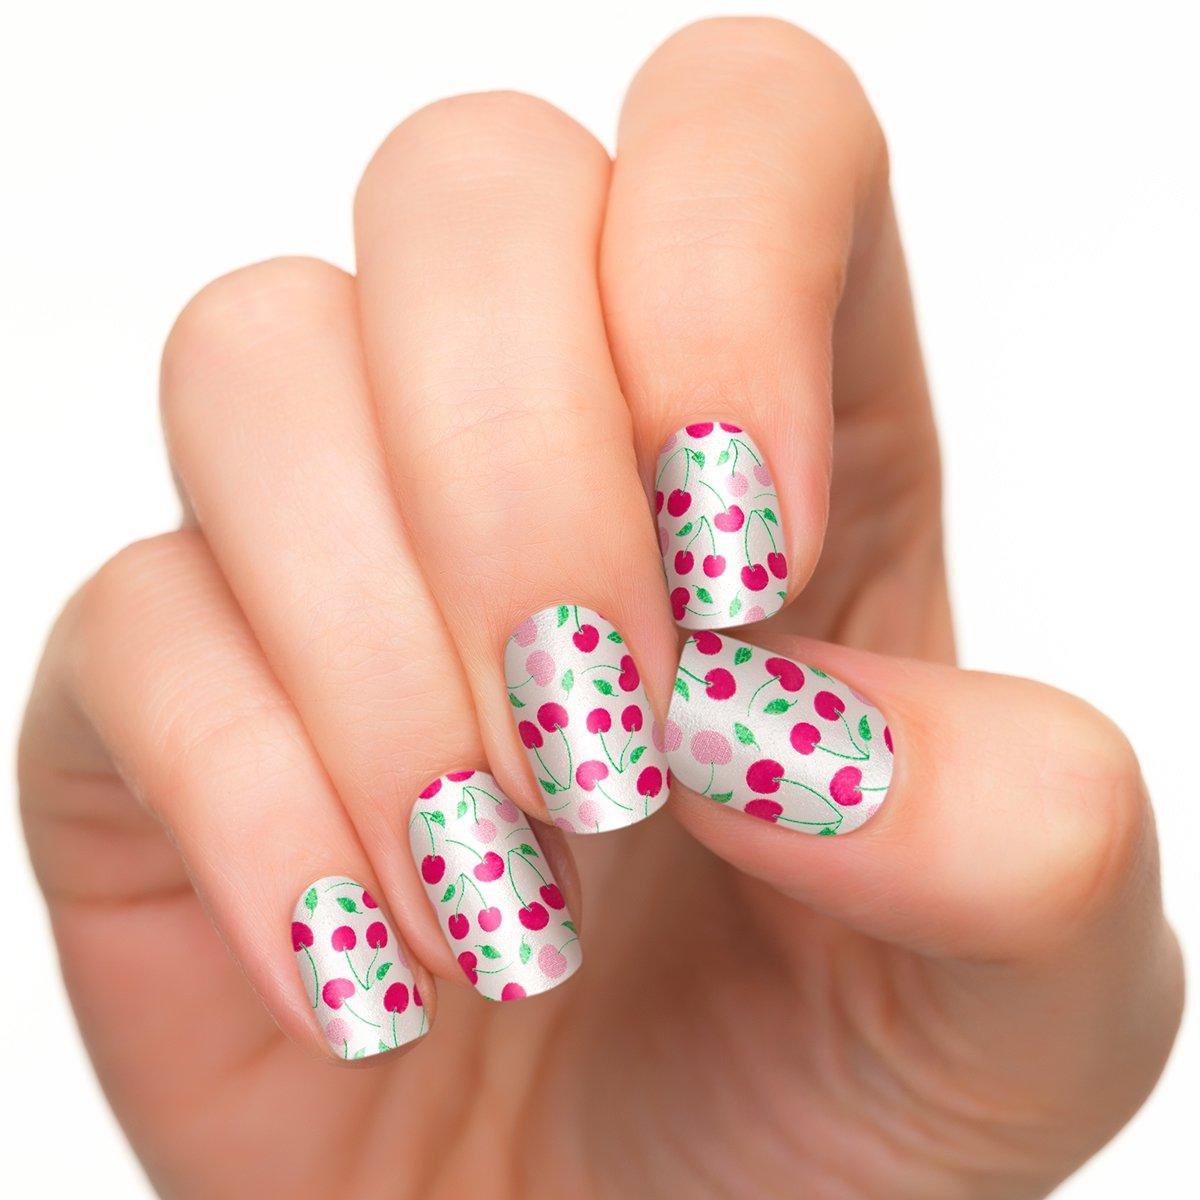 Incoco Nail Polish Strips, Cherries Nail Art, Cherry Jubilee